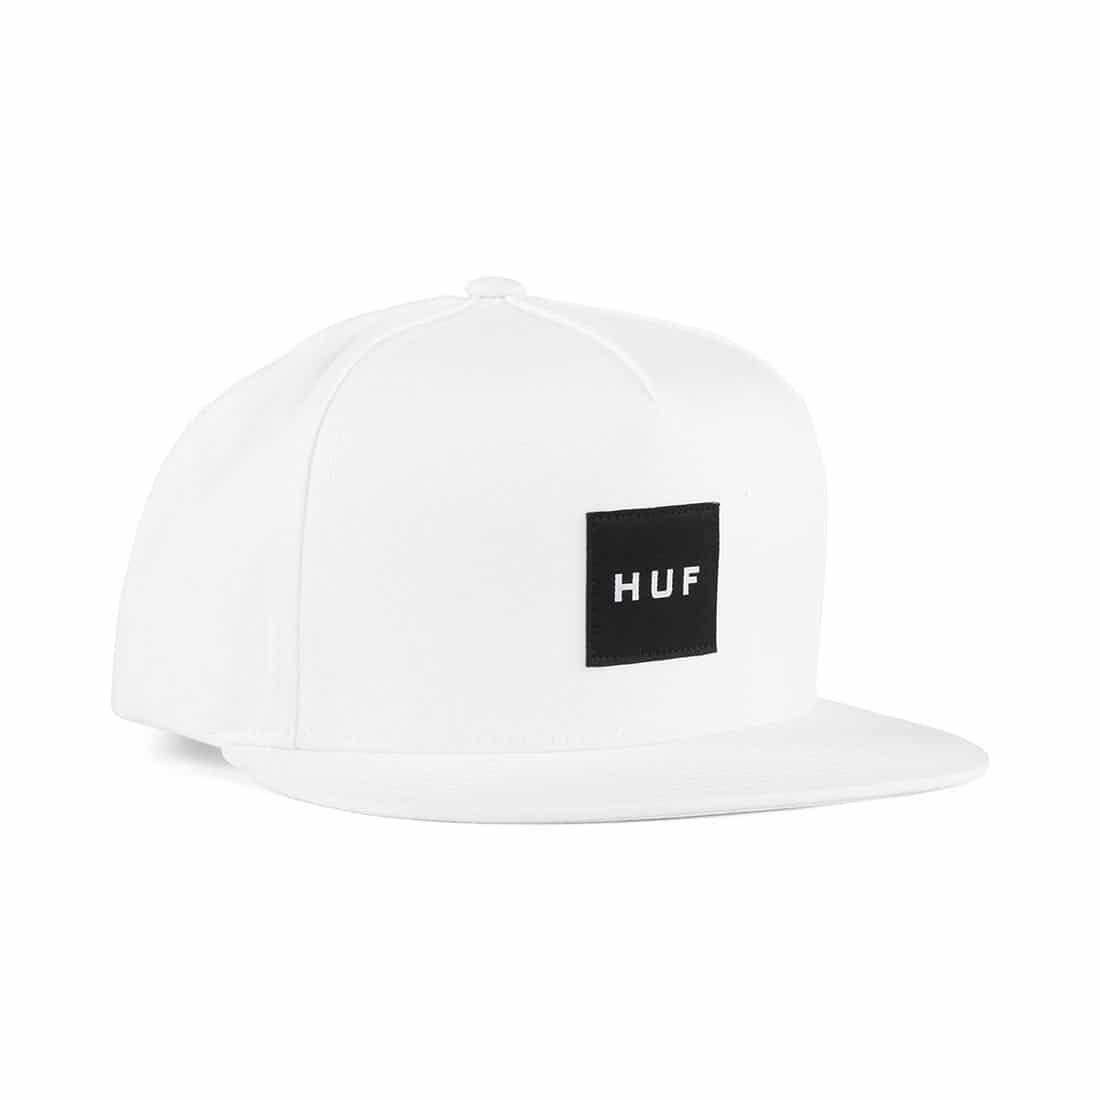 177a65262 HUF Essentials Box Snapback Hat - White